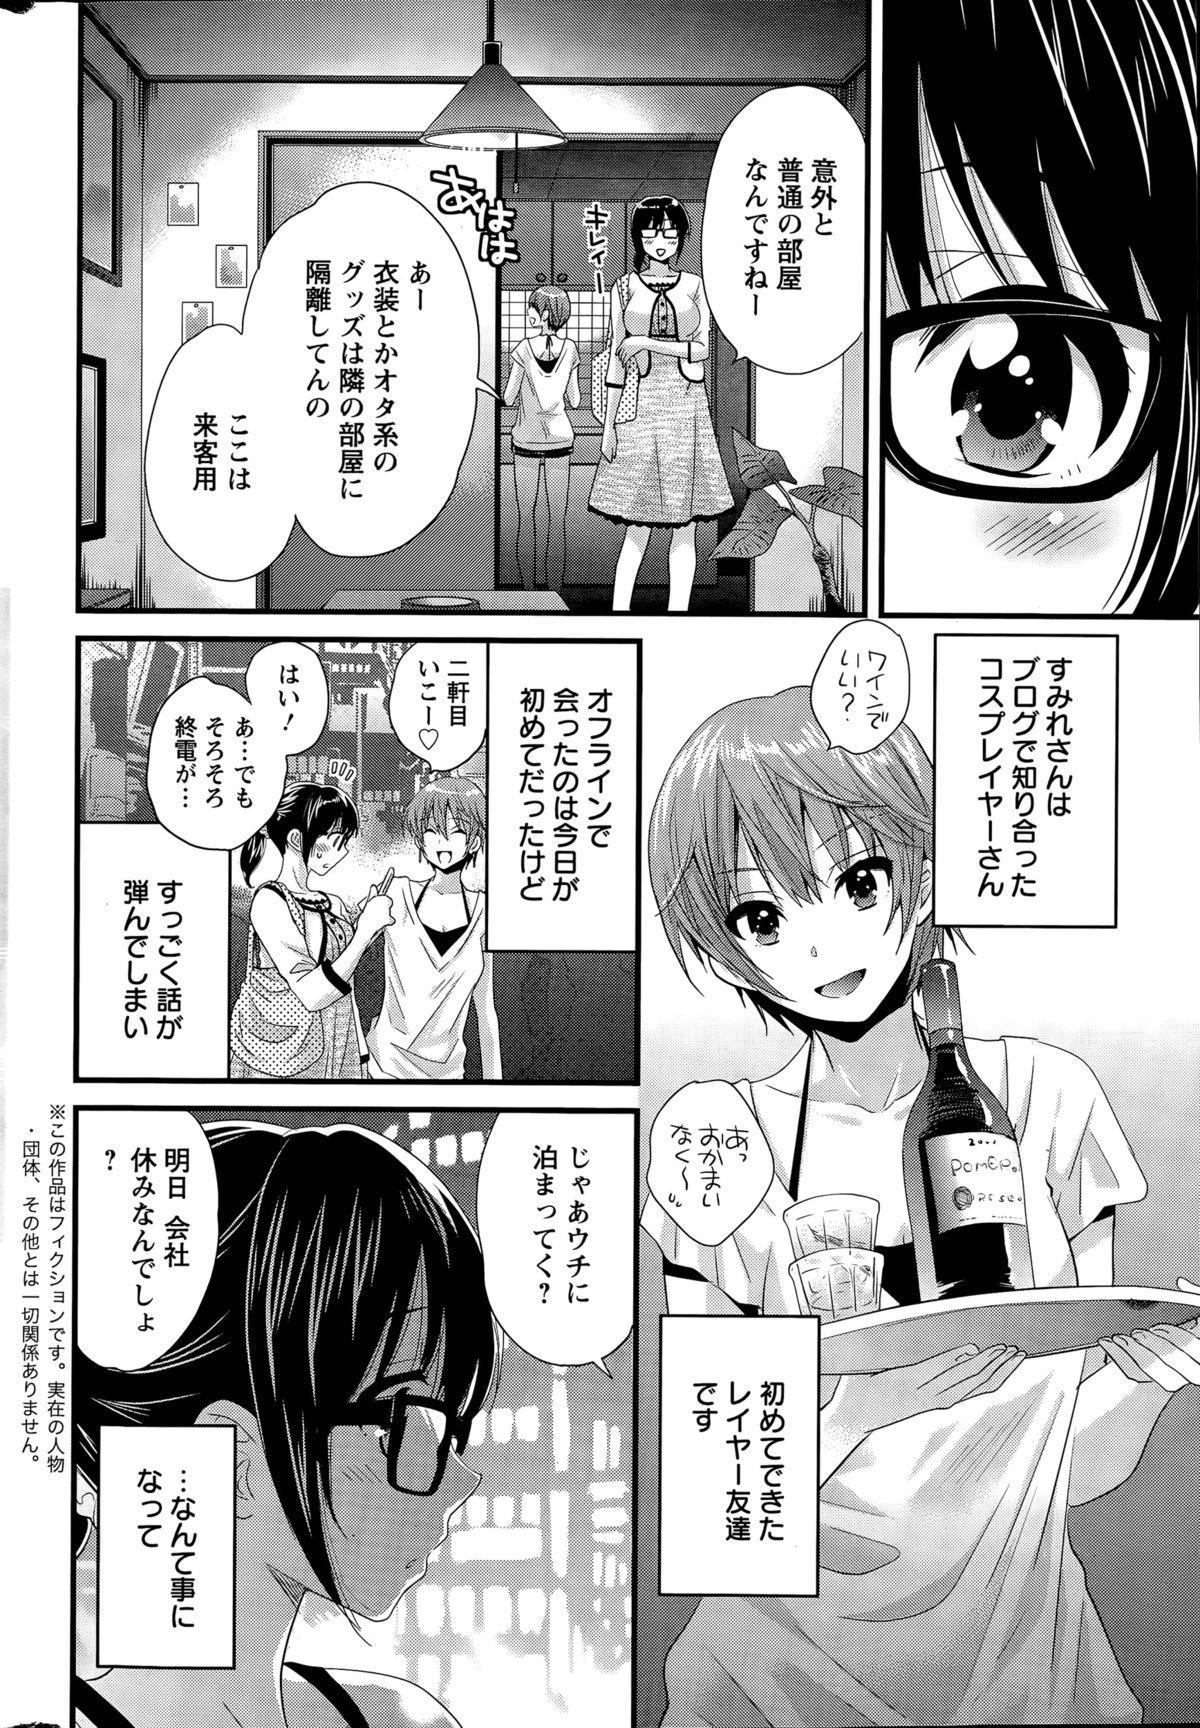 [Pon Takahanada] Otani-san no Cosplay Jijou Ch. 1-5 37